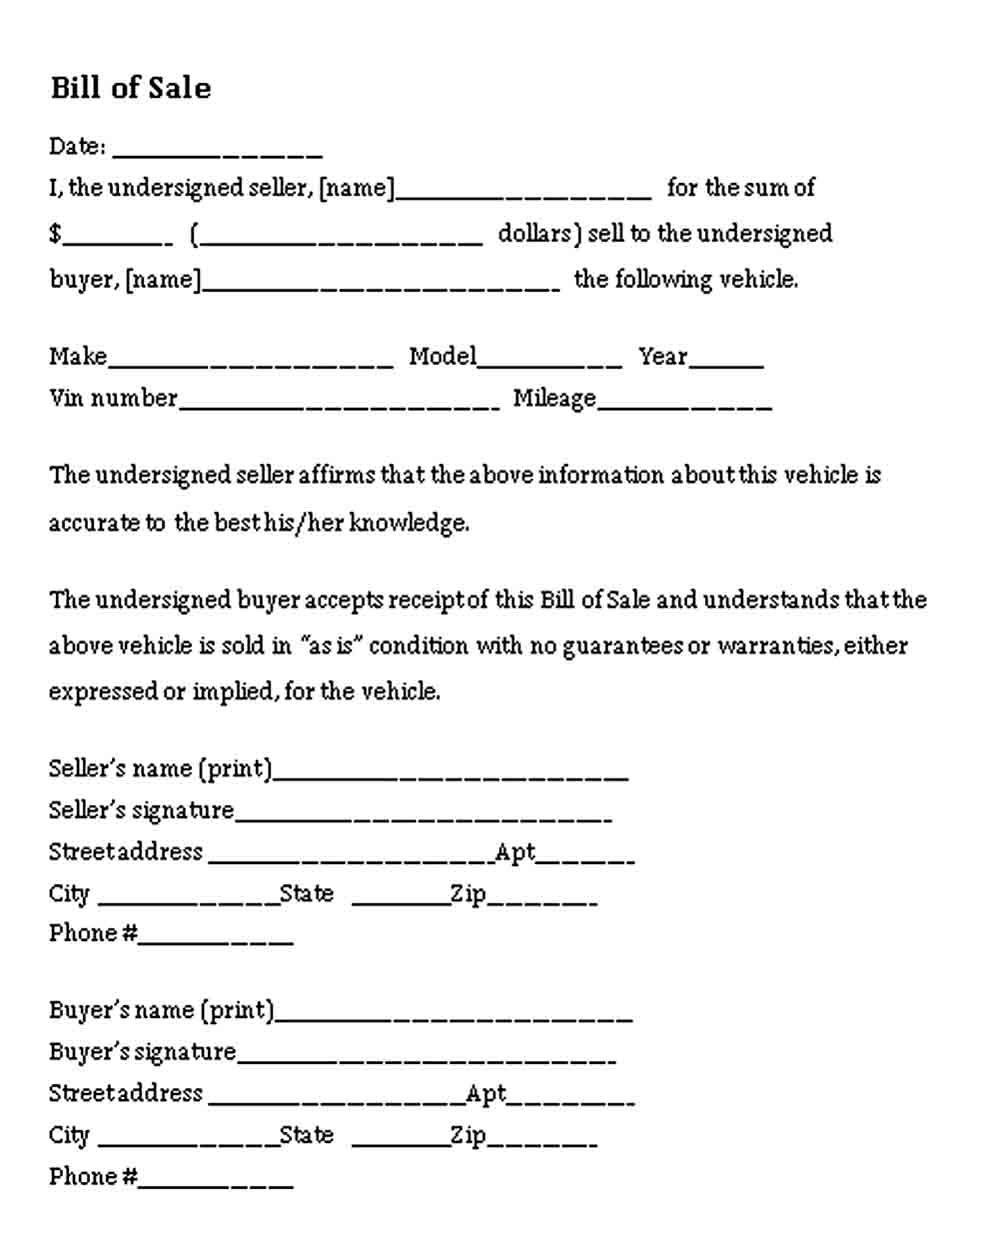 Bill of Sale Form   Bills, Business template, Templates